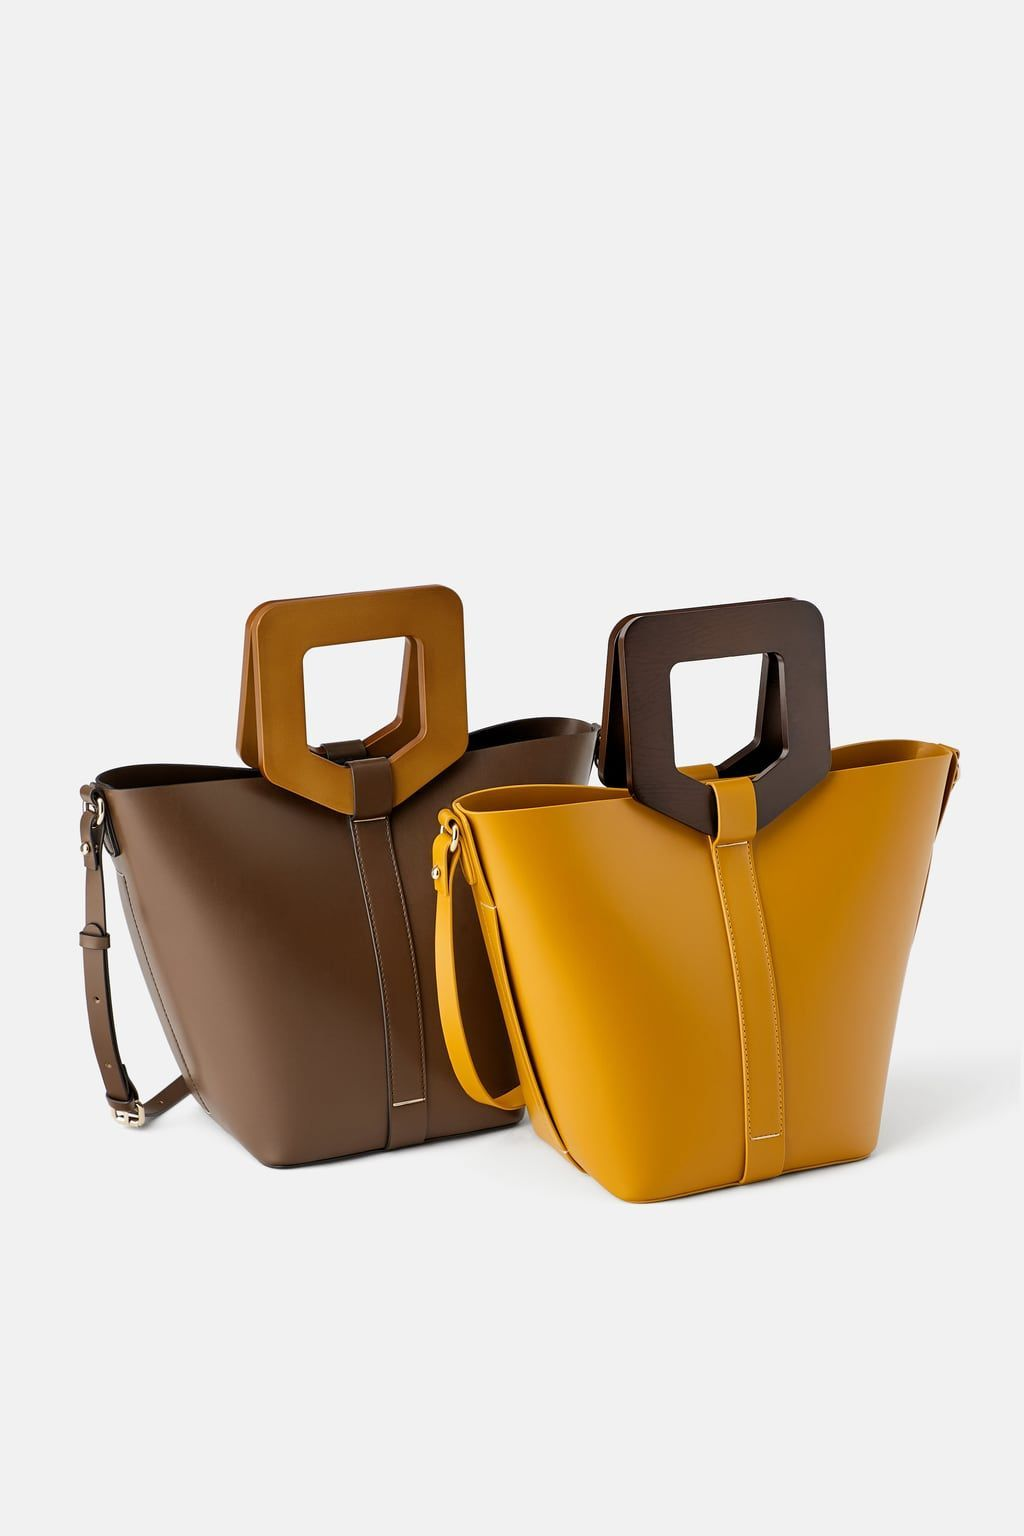 Sztywna Torba Typu Shopper Z RĄczkami Z Tworzywa ImitujĄcego Drewno Bolsodelasmujeres Dre In 2020 Lederhandtaschen Designer Taschen Shopper Tasche